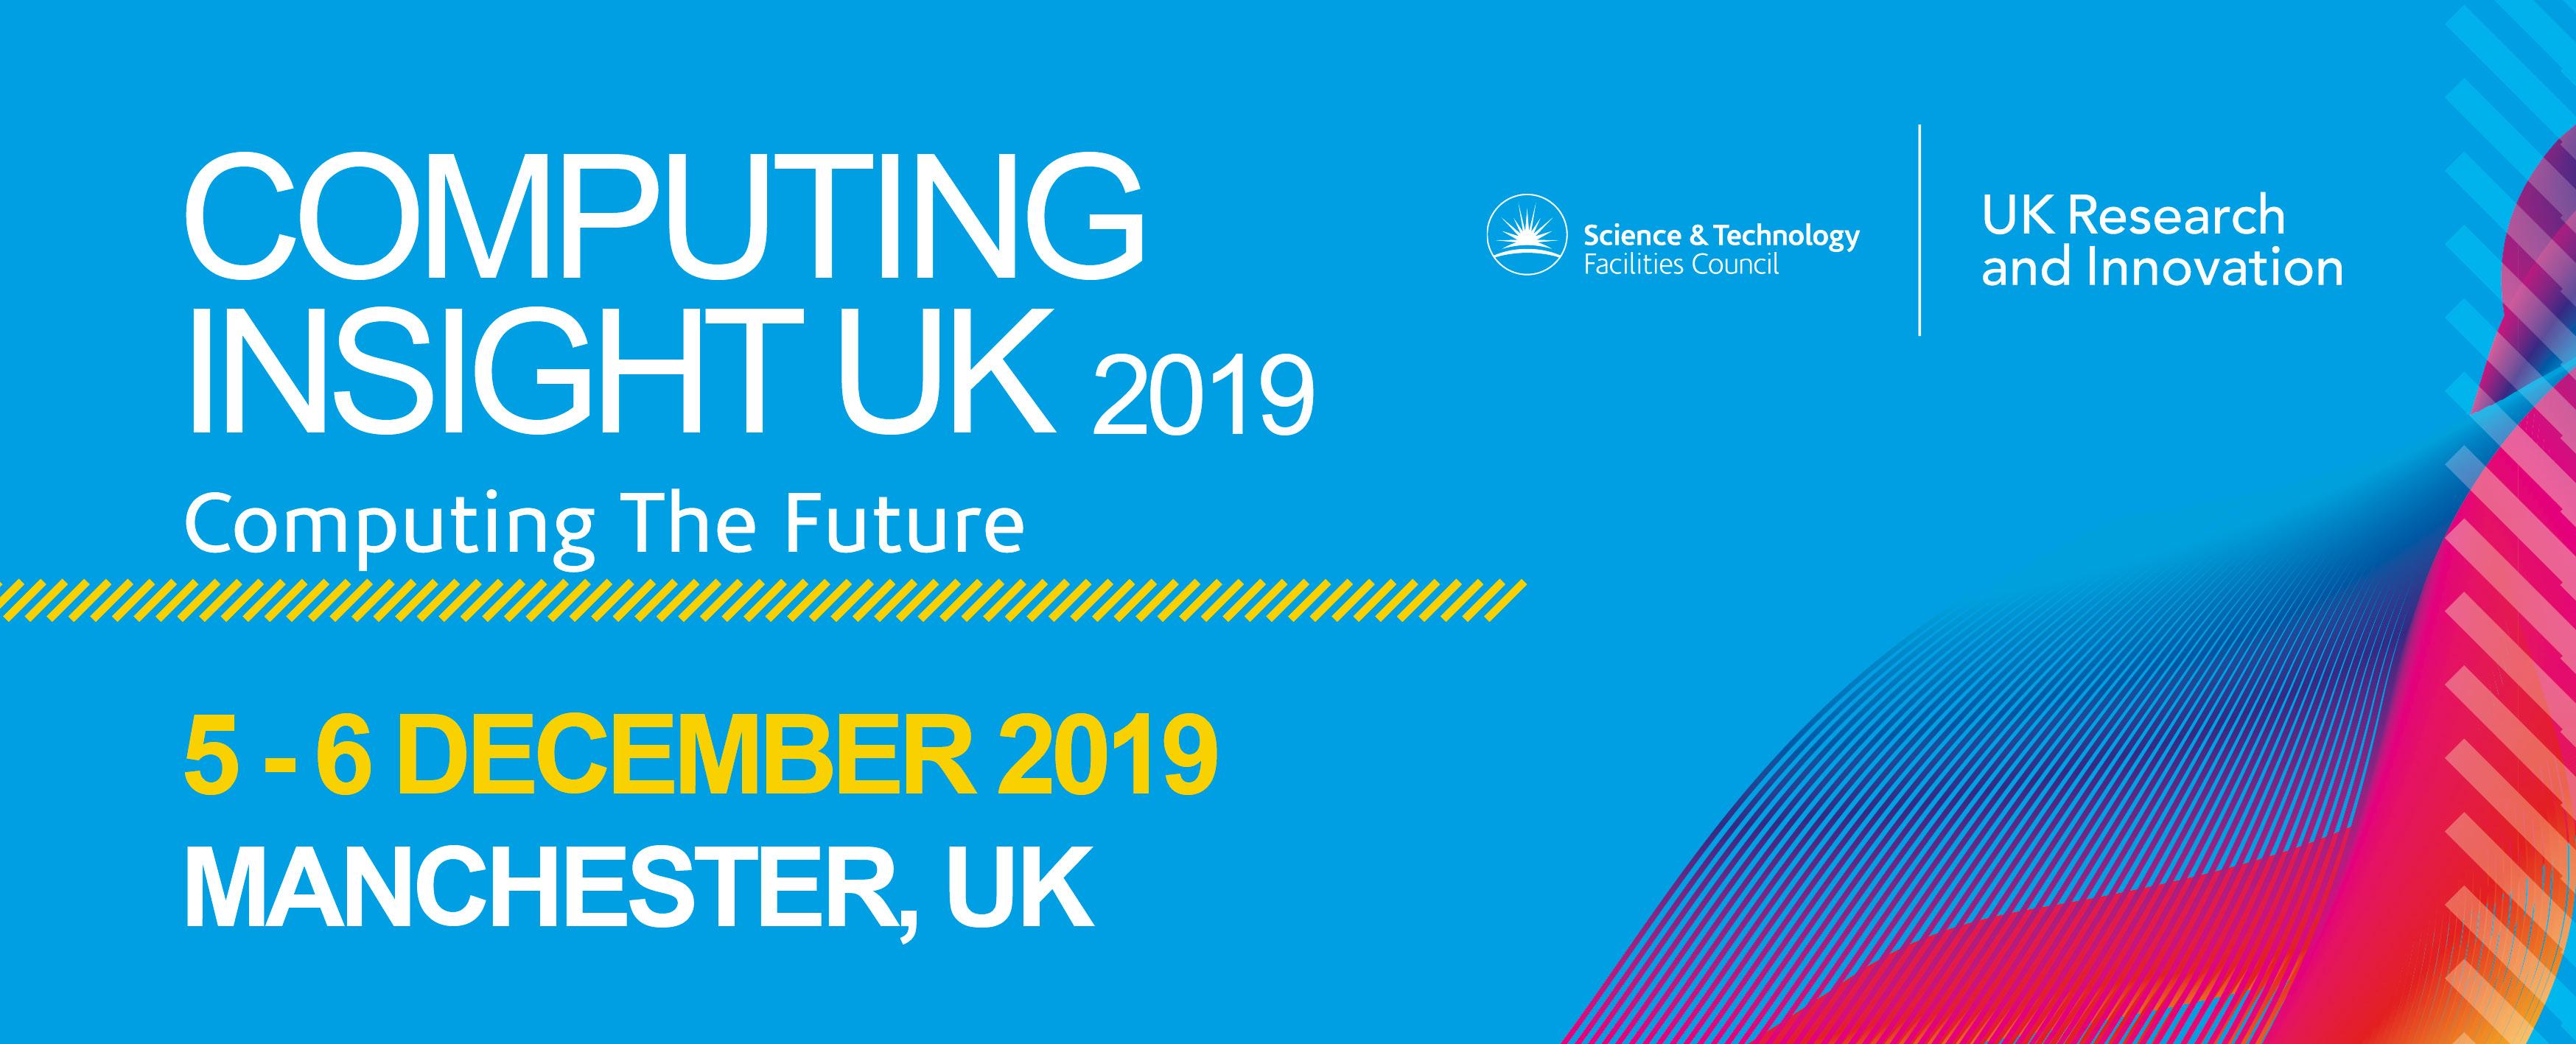 Computing Insight UK 2019